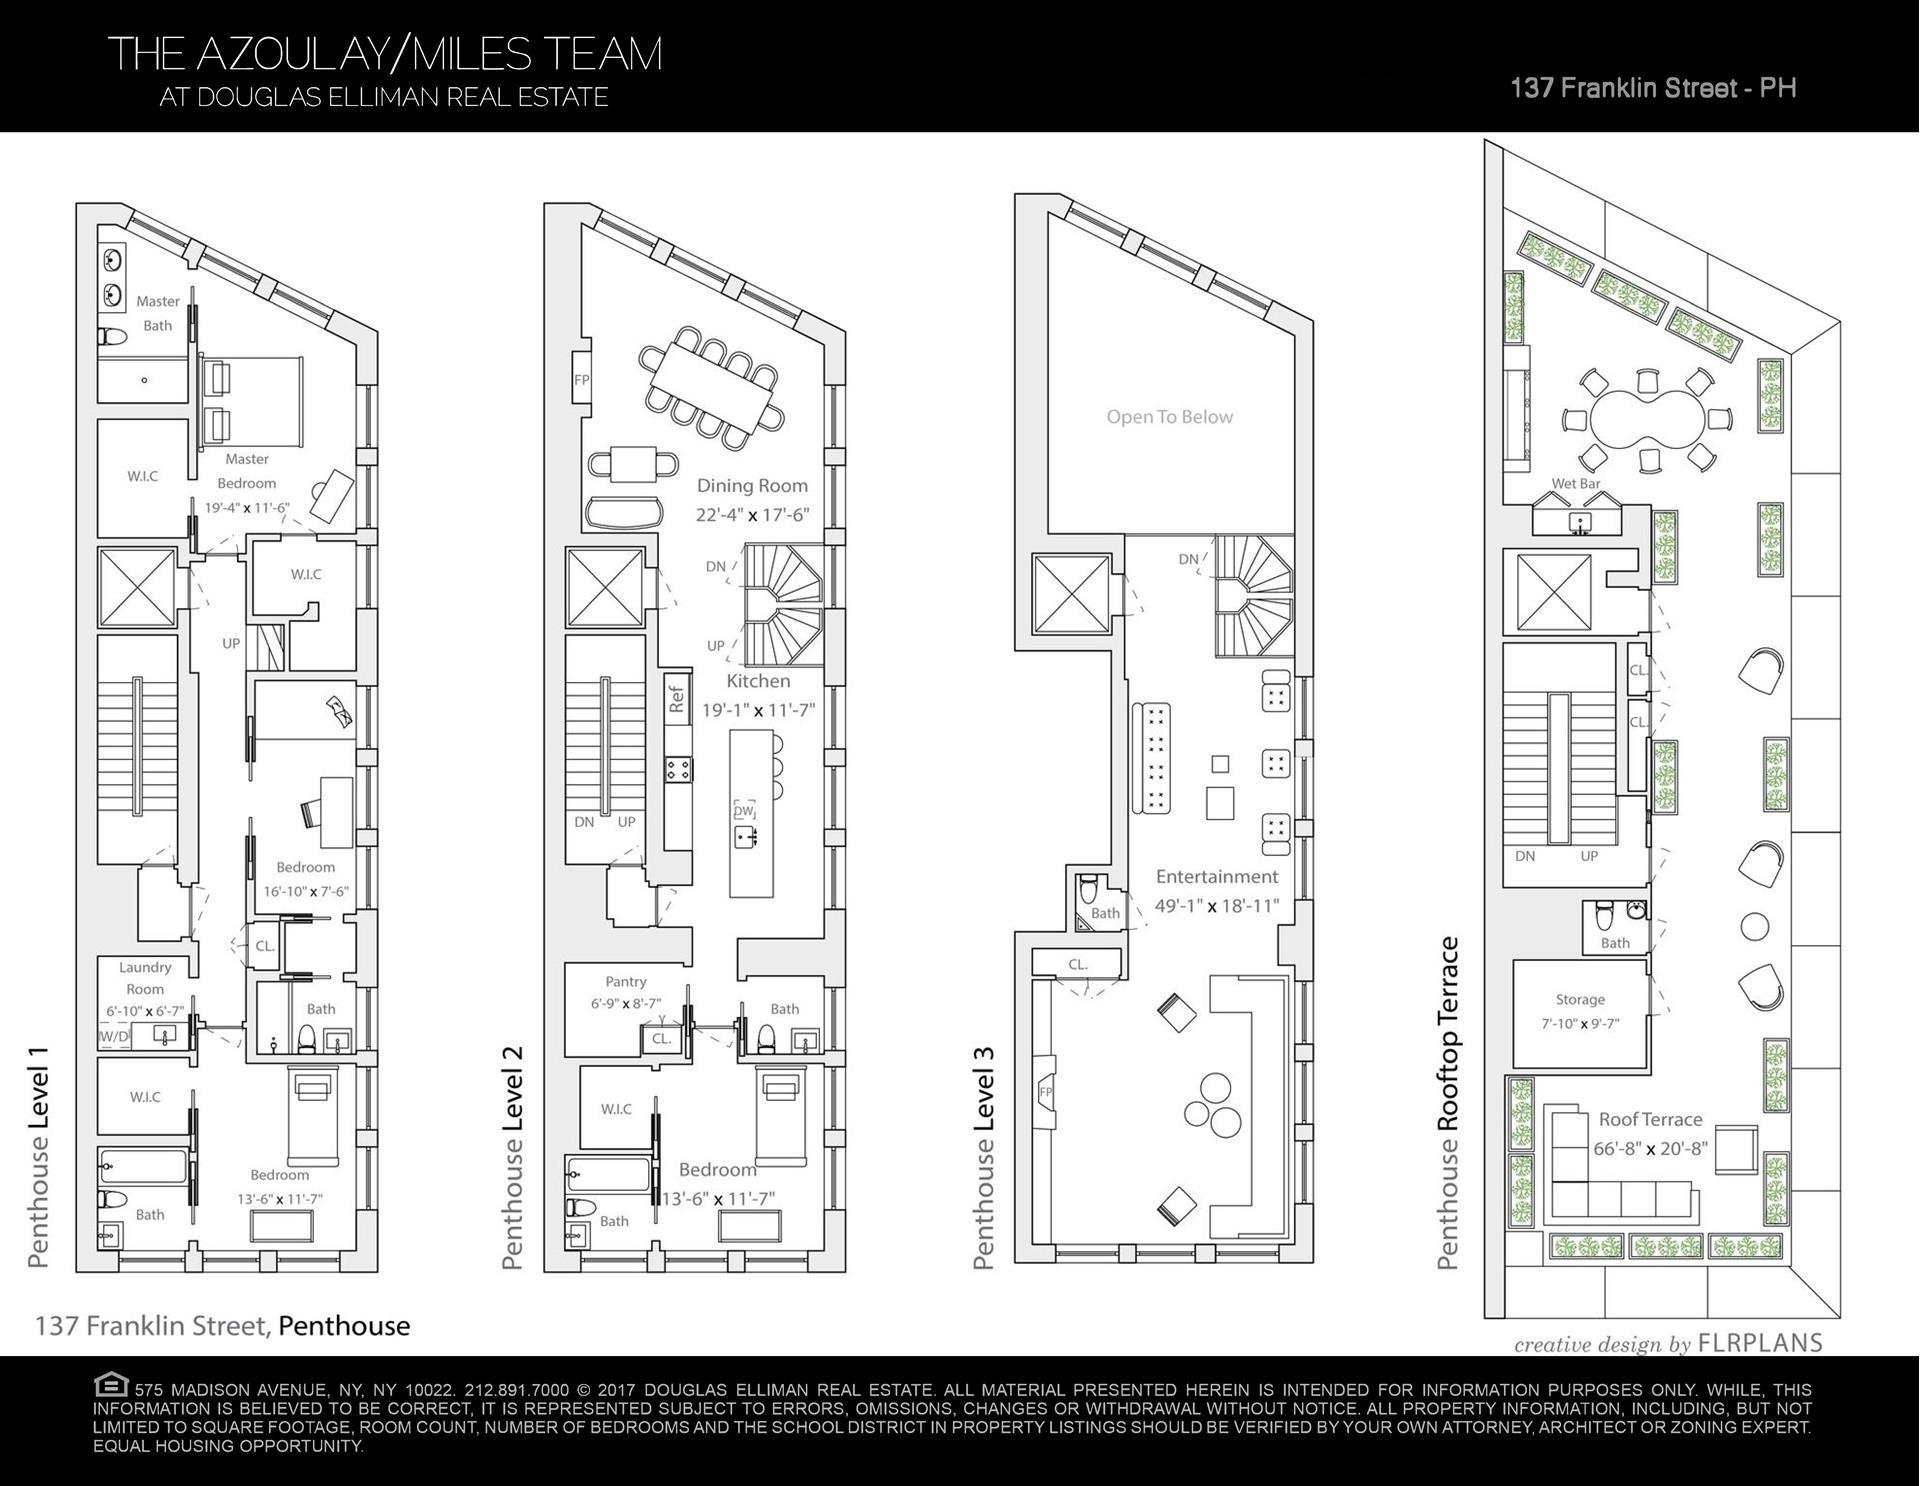 Floor plan of 137 Franklin St, PH - TriBeCa, New York